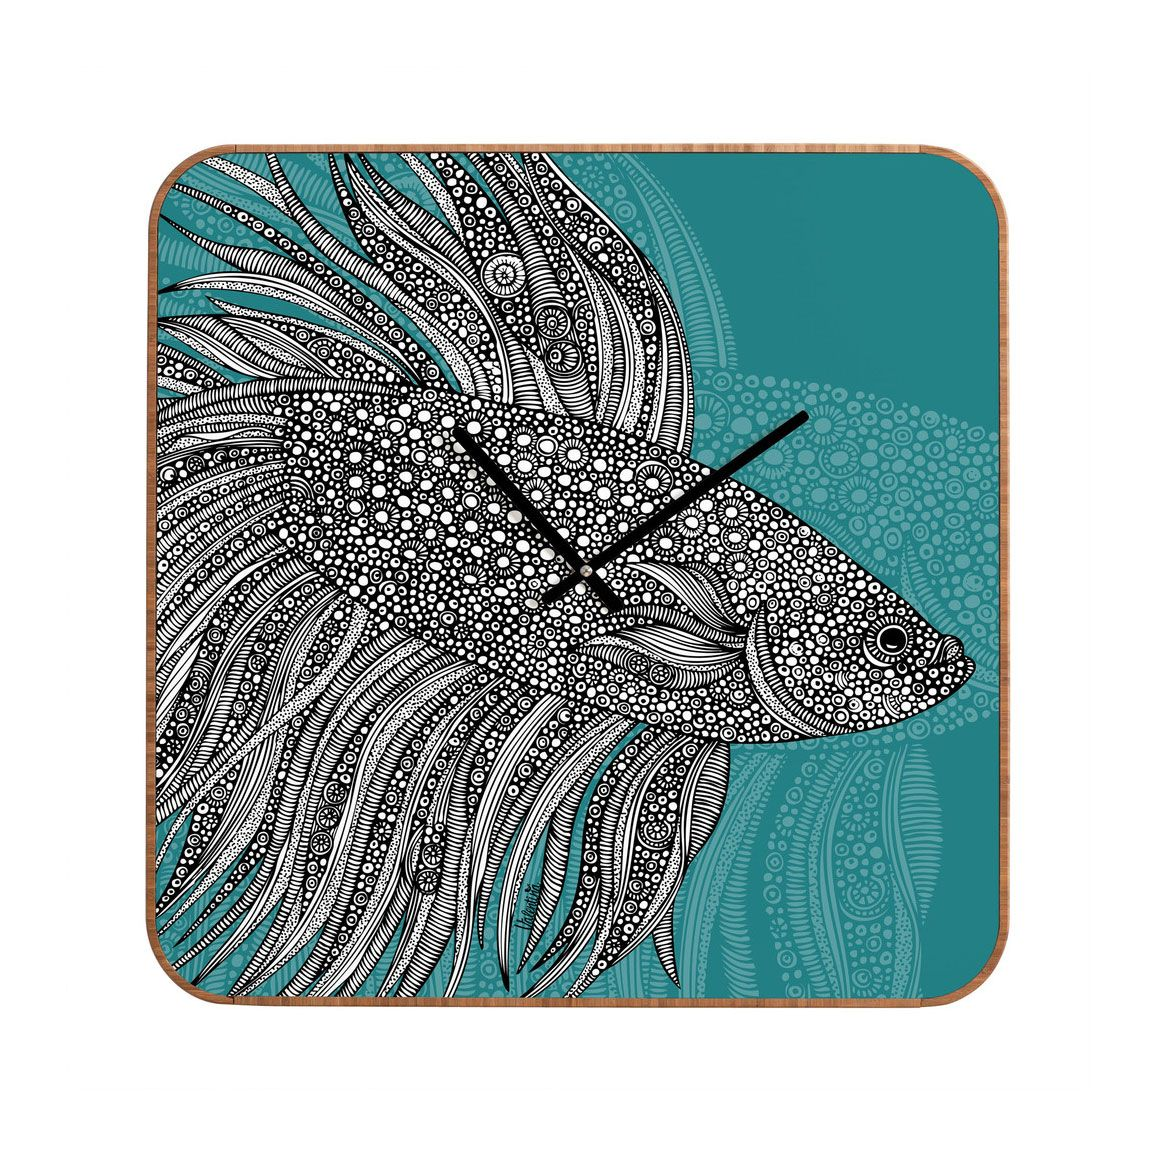 Dotty fish wall clock zentangle inspiration pinterest wall dotty fish wall clock amipublicfo Images